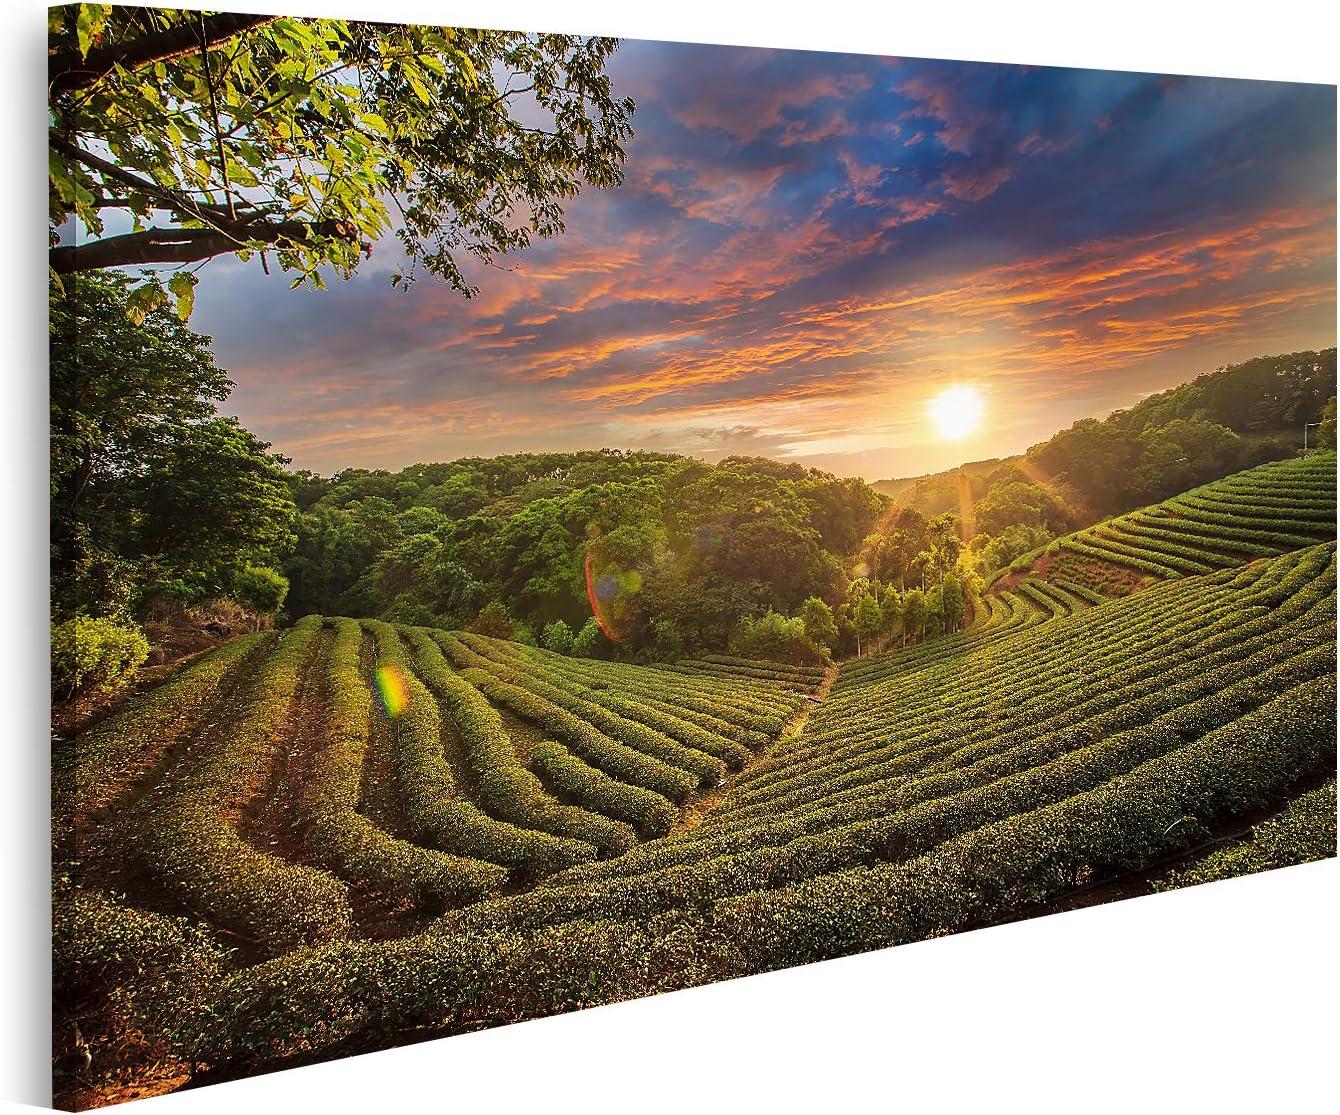 Bild auf Leinwand Sonnenuntergang im Weinberg Wandbild Poster Leinwand